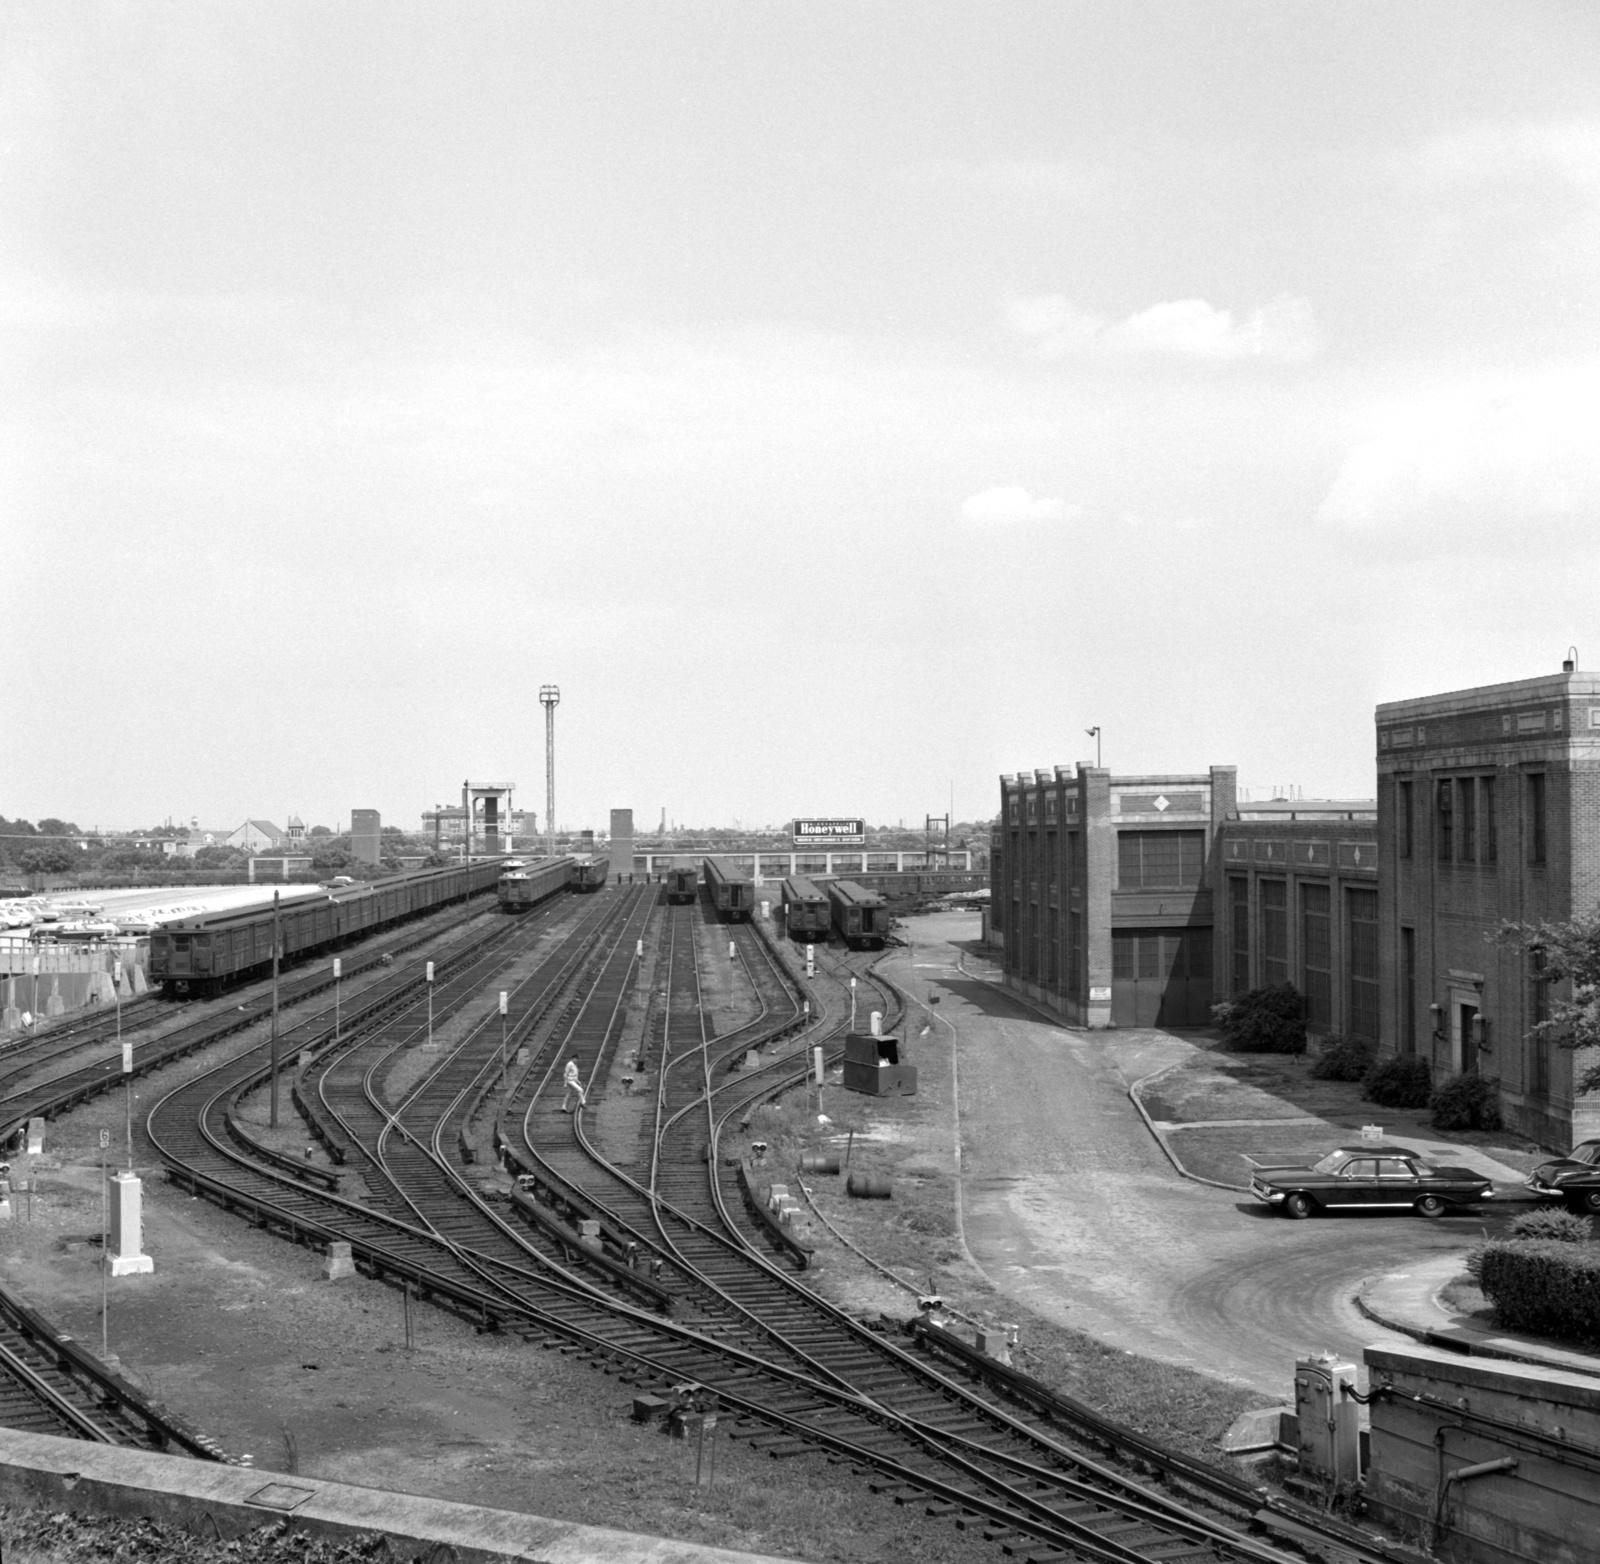 (708k, 1600x1564)<br><b>Country:</b> United States<br><b>City:</b> Philadelphia, PA<br><b>System:</b> SEPTA (or Predecessor)<br><b>Line:</b> Broad Street Subway<br><b>Location:</b> Fern Rock Yard/Shops<br><b>Collection of:</b> David Pirmann<br><b>Date:</b> 6/15/1963<br><b>Viewed (this week/total):</b> 0 / 63